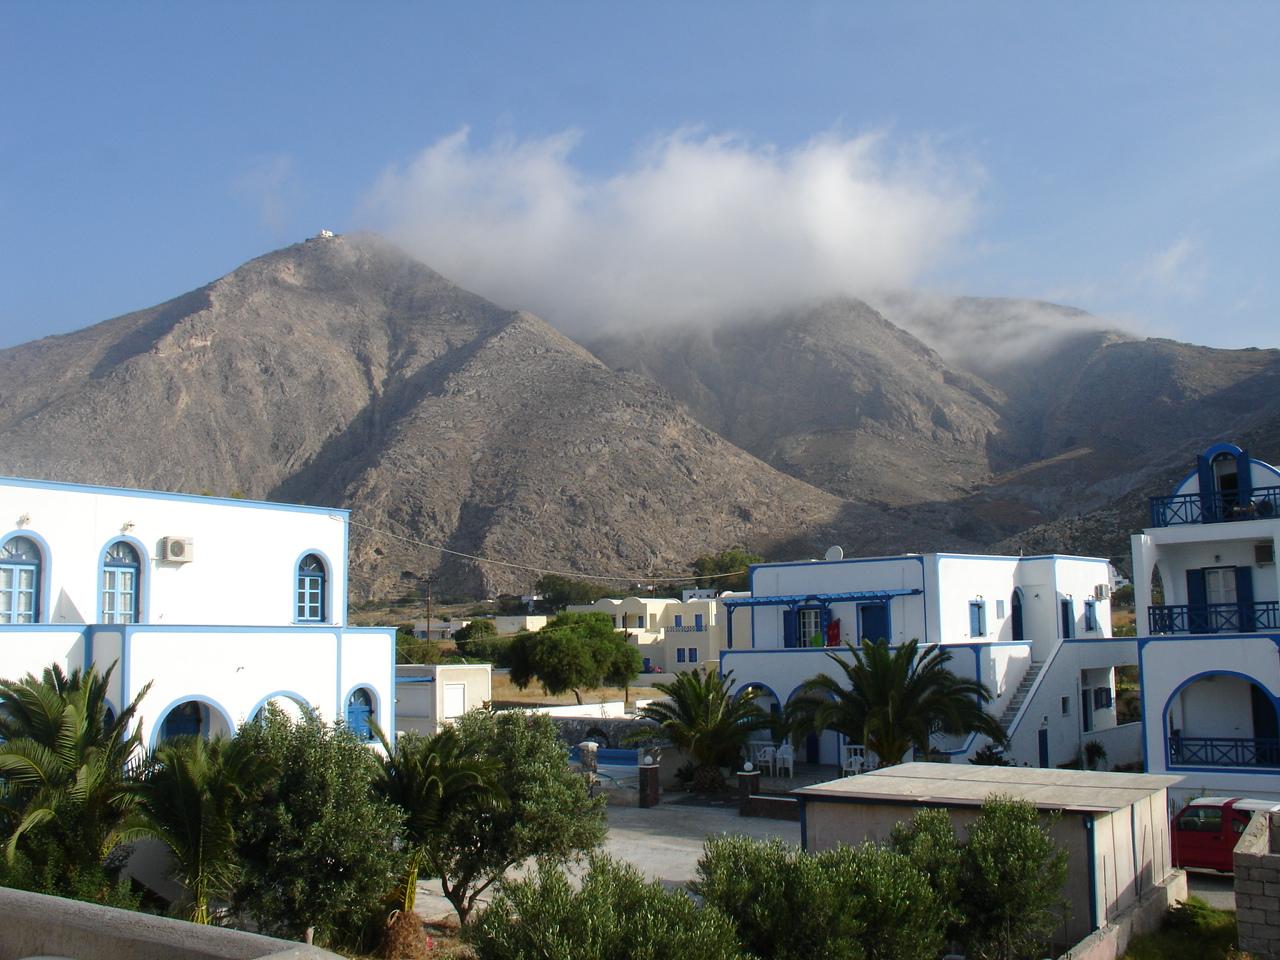 File:Profitis Ilias, Santorini.jpg - Wikimedia Commons